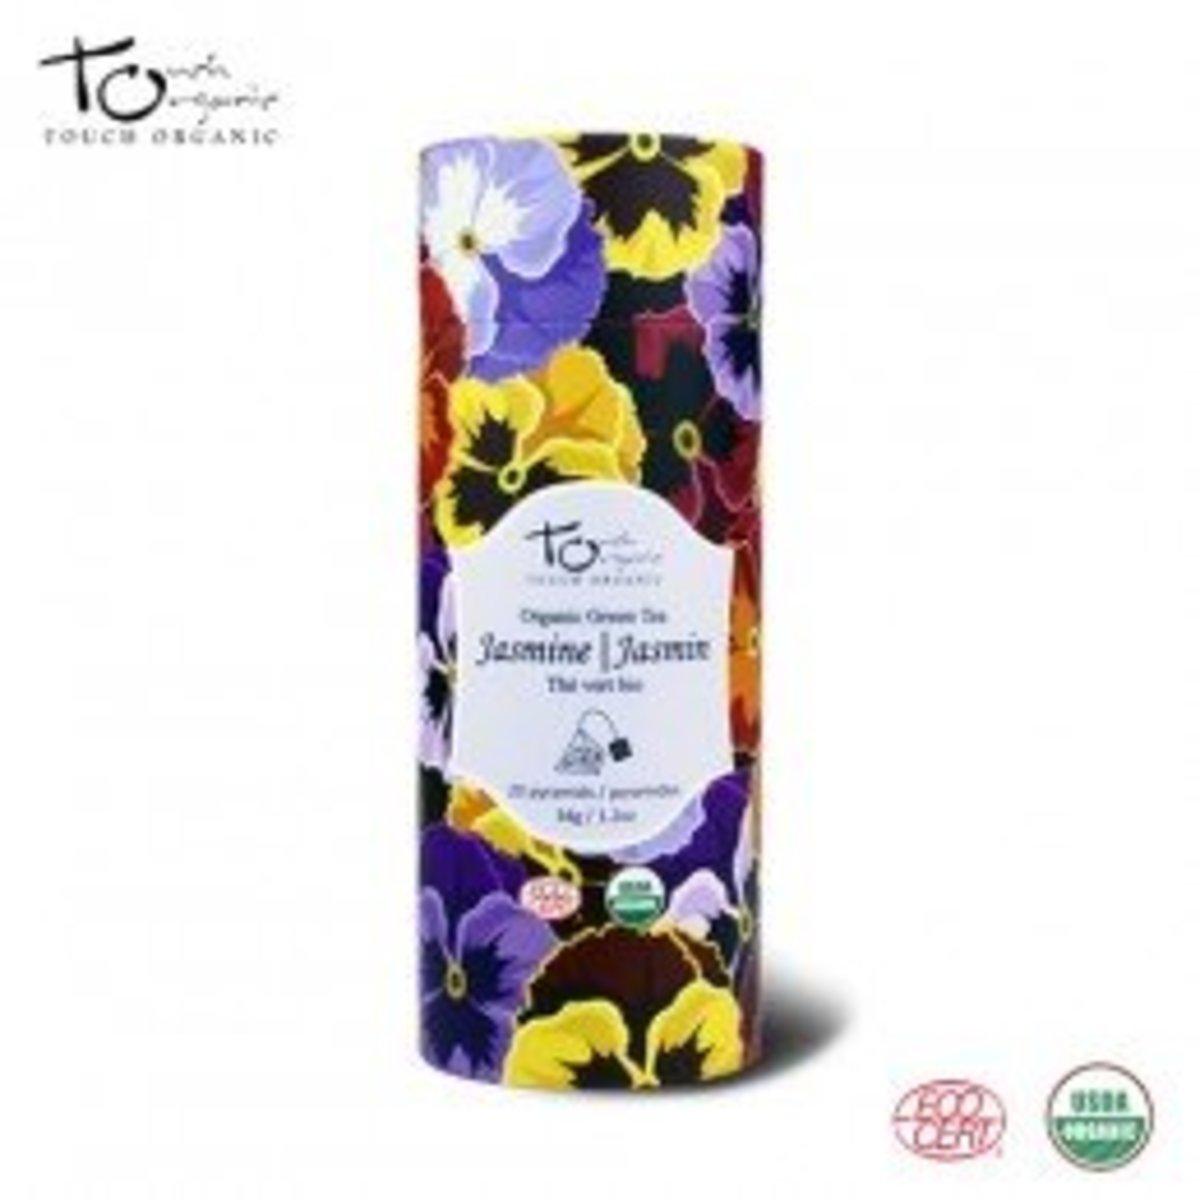 Touch Organic Jasmine Tea (20 Bags)